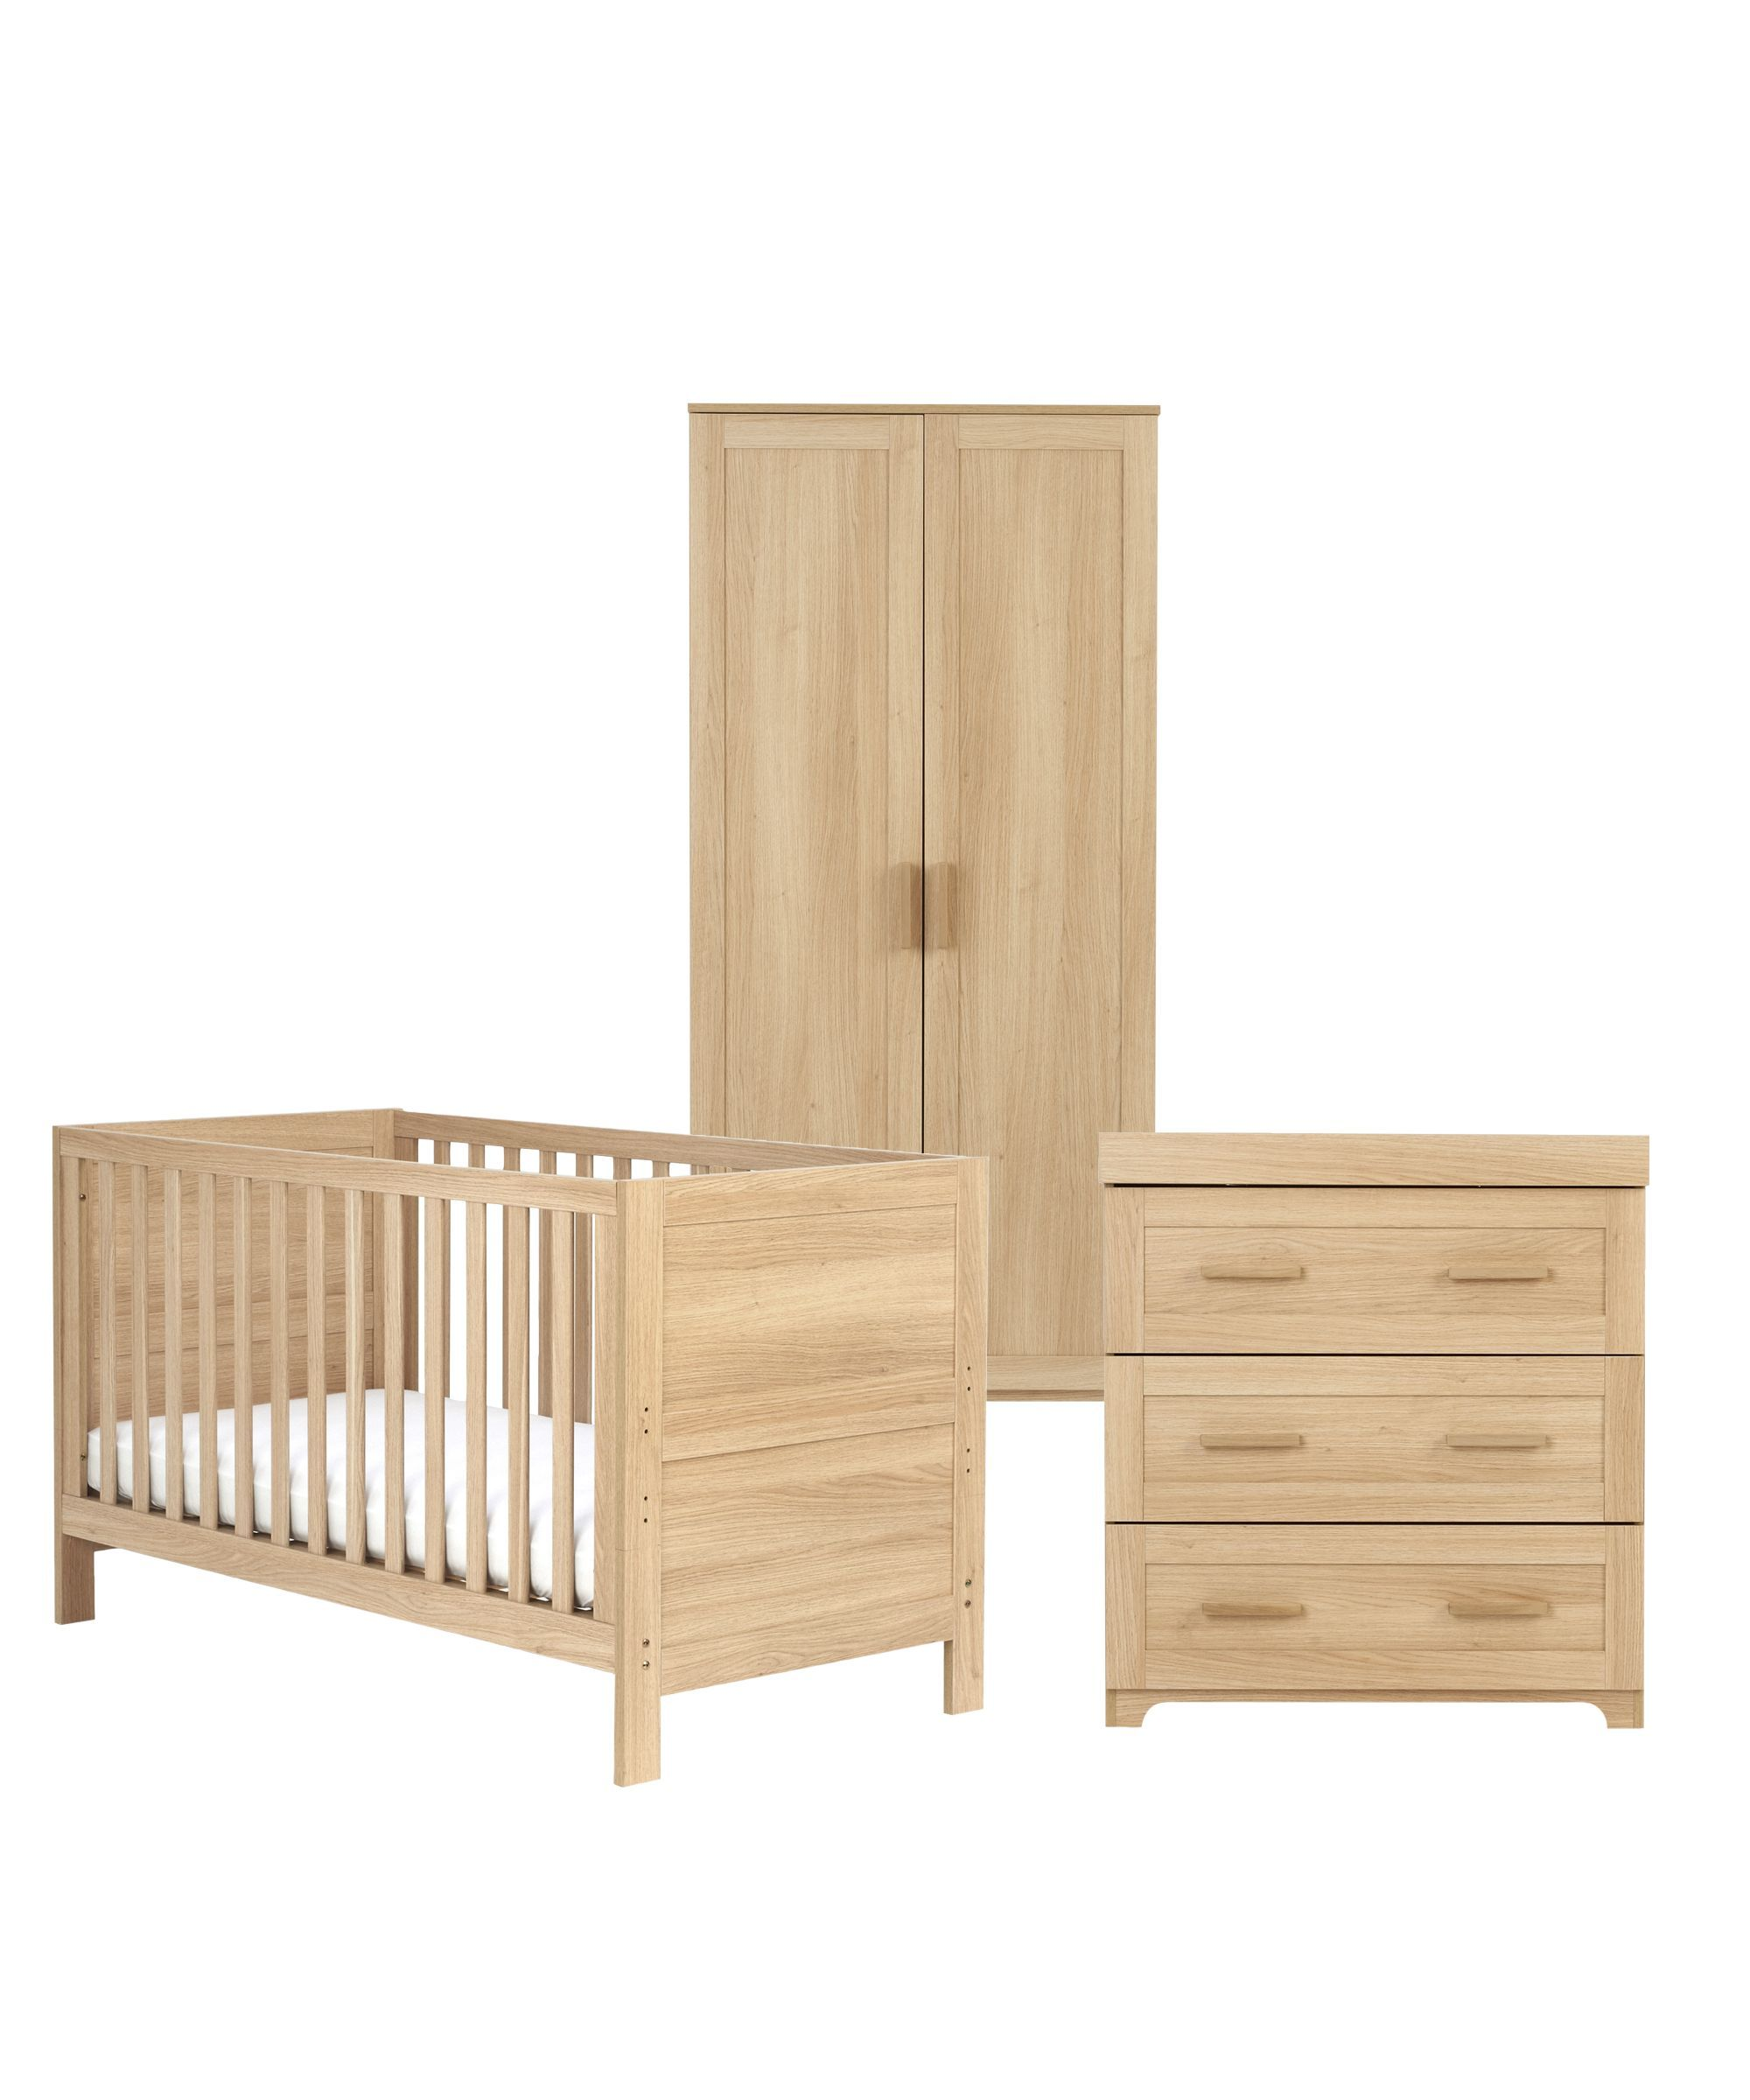 Mothercare Stretton 3 Piece Nursery Furniture Set Baby Pinterest